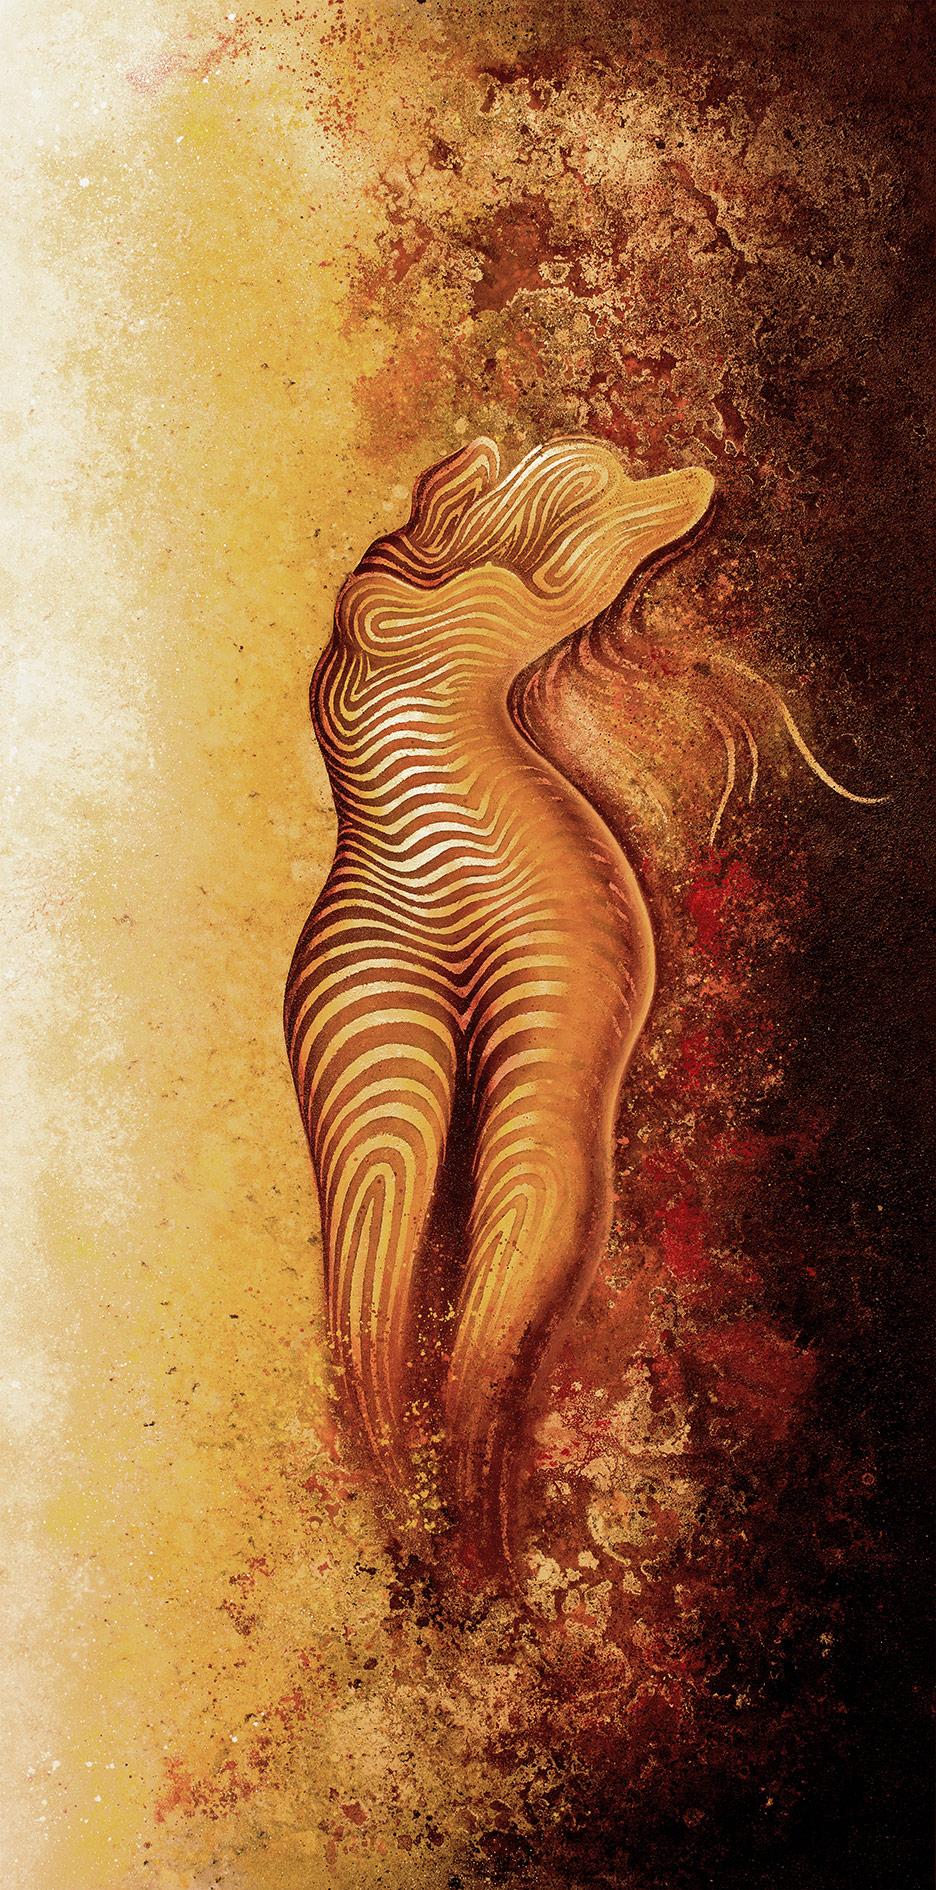 Frauen Akt (100x200cm) -Acryl, Sprühlack, Schlagmetall, Kreide Pigmente auf Leinwand